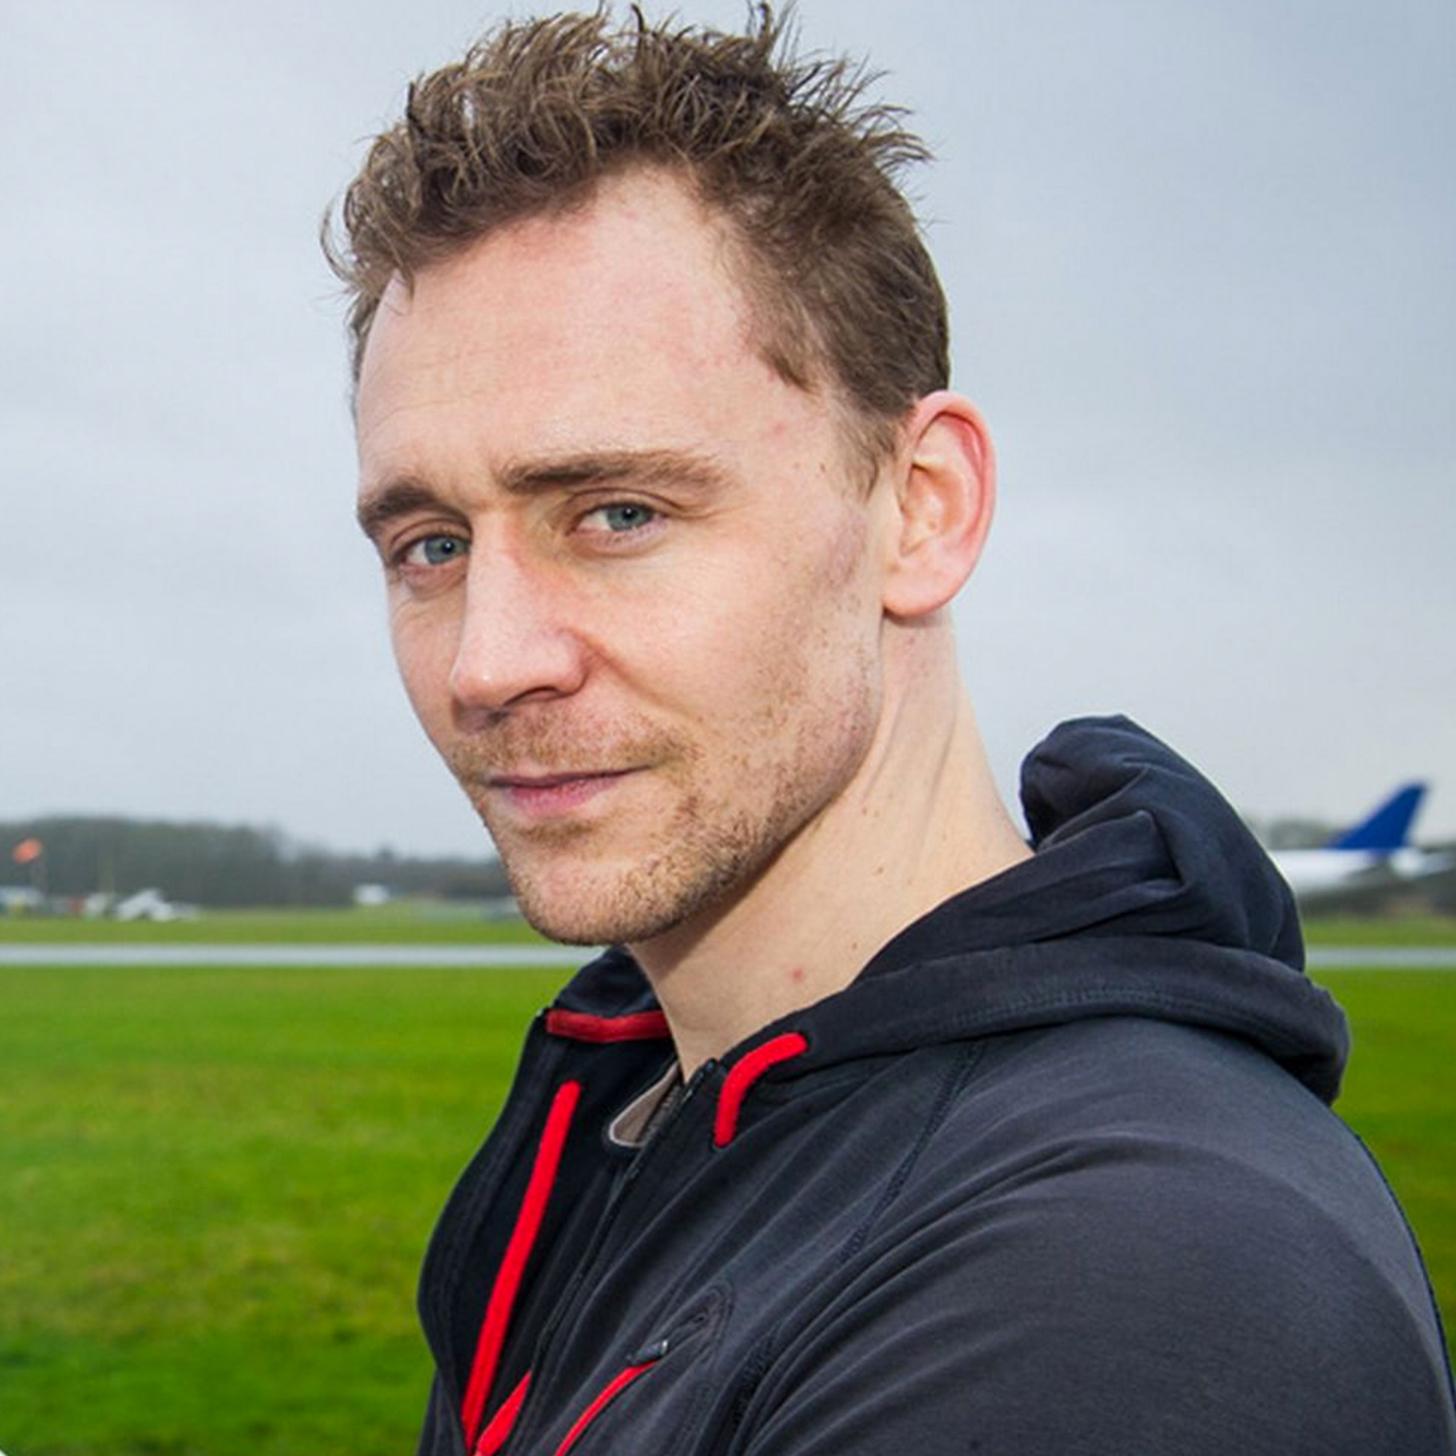 Tom Hiddleston Photos